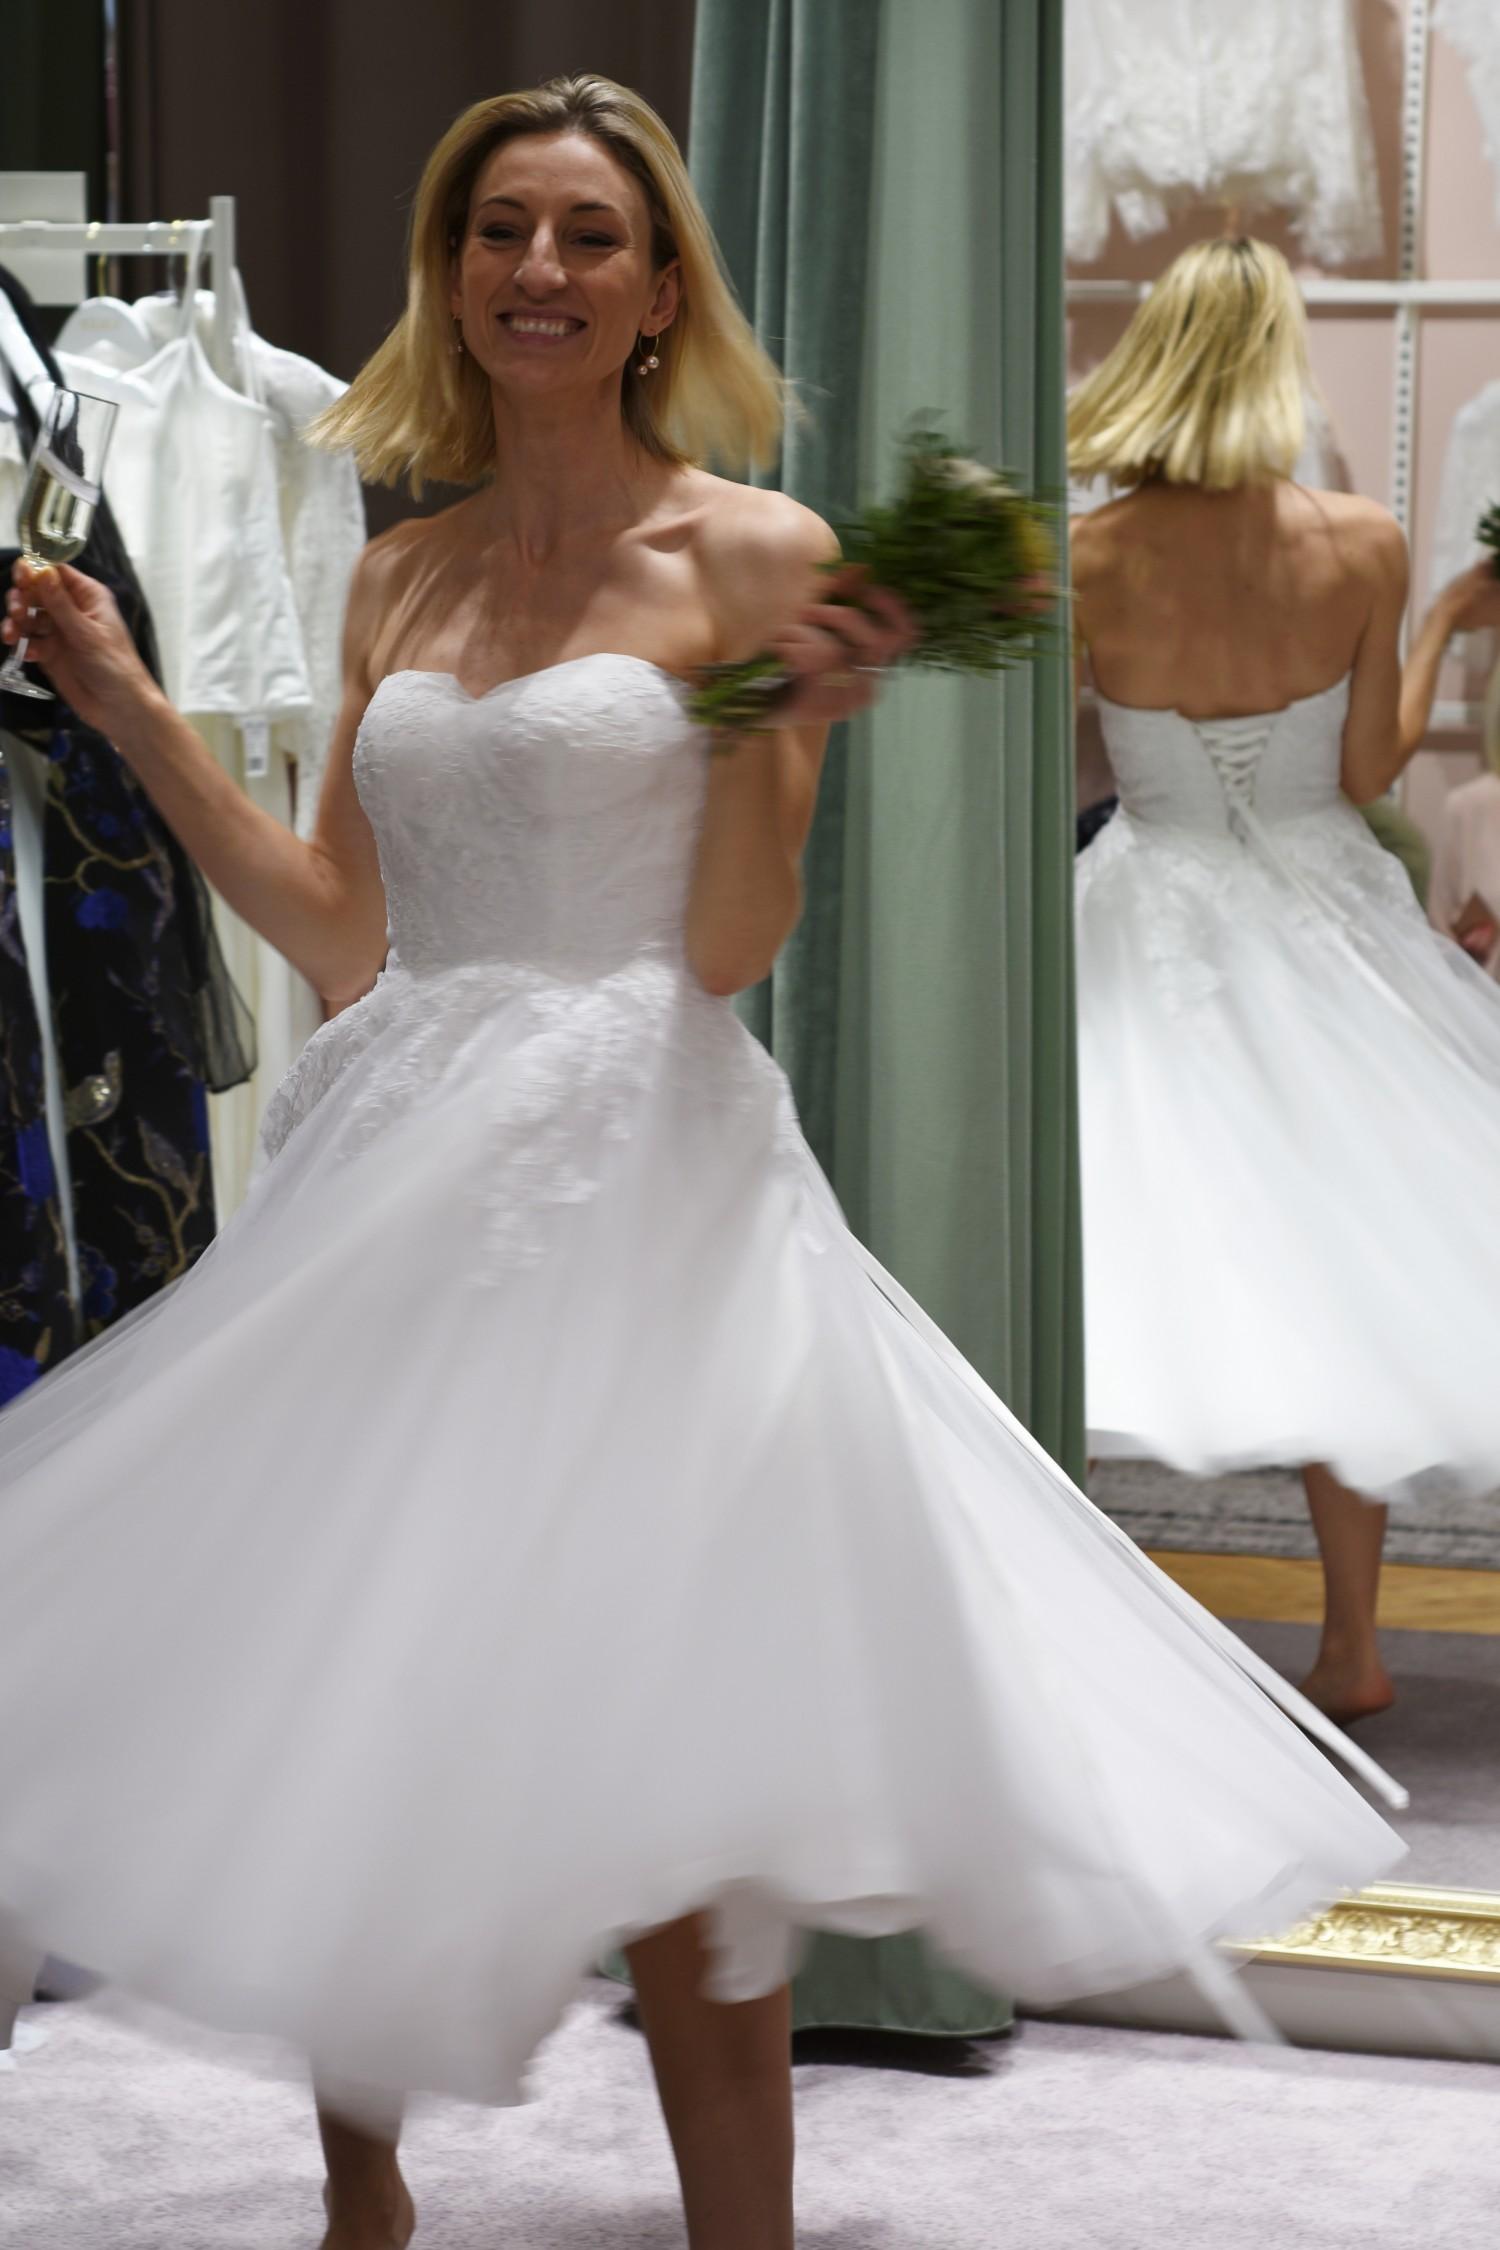 lilly-brudekjoler-annemette-voss-77